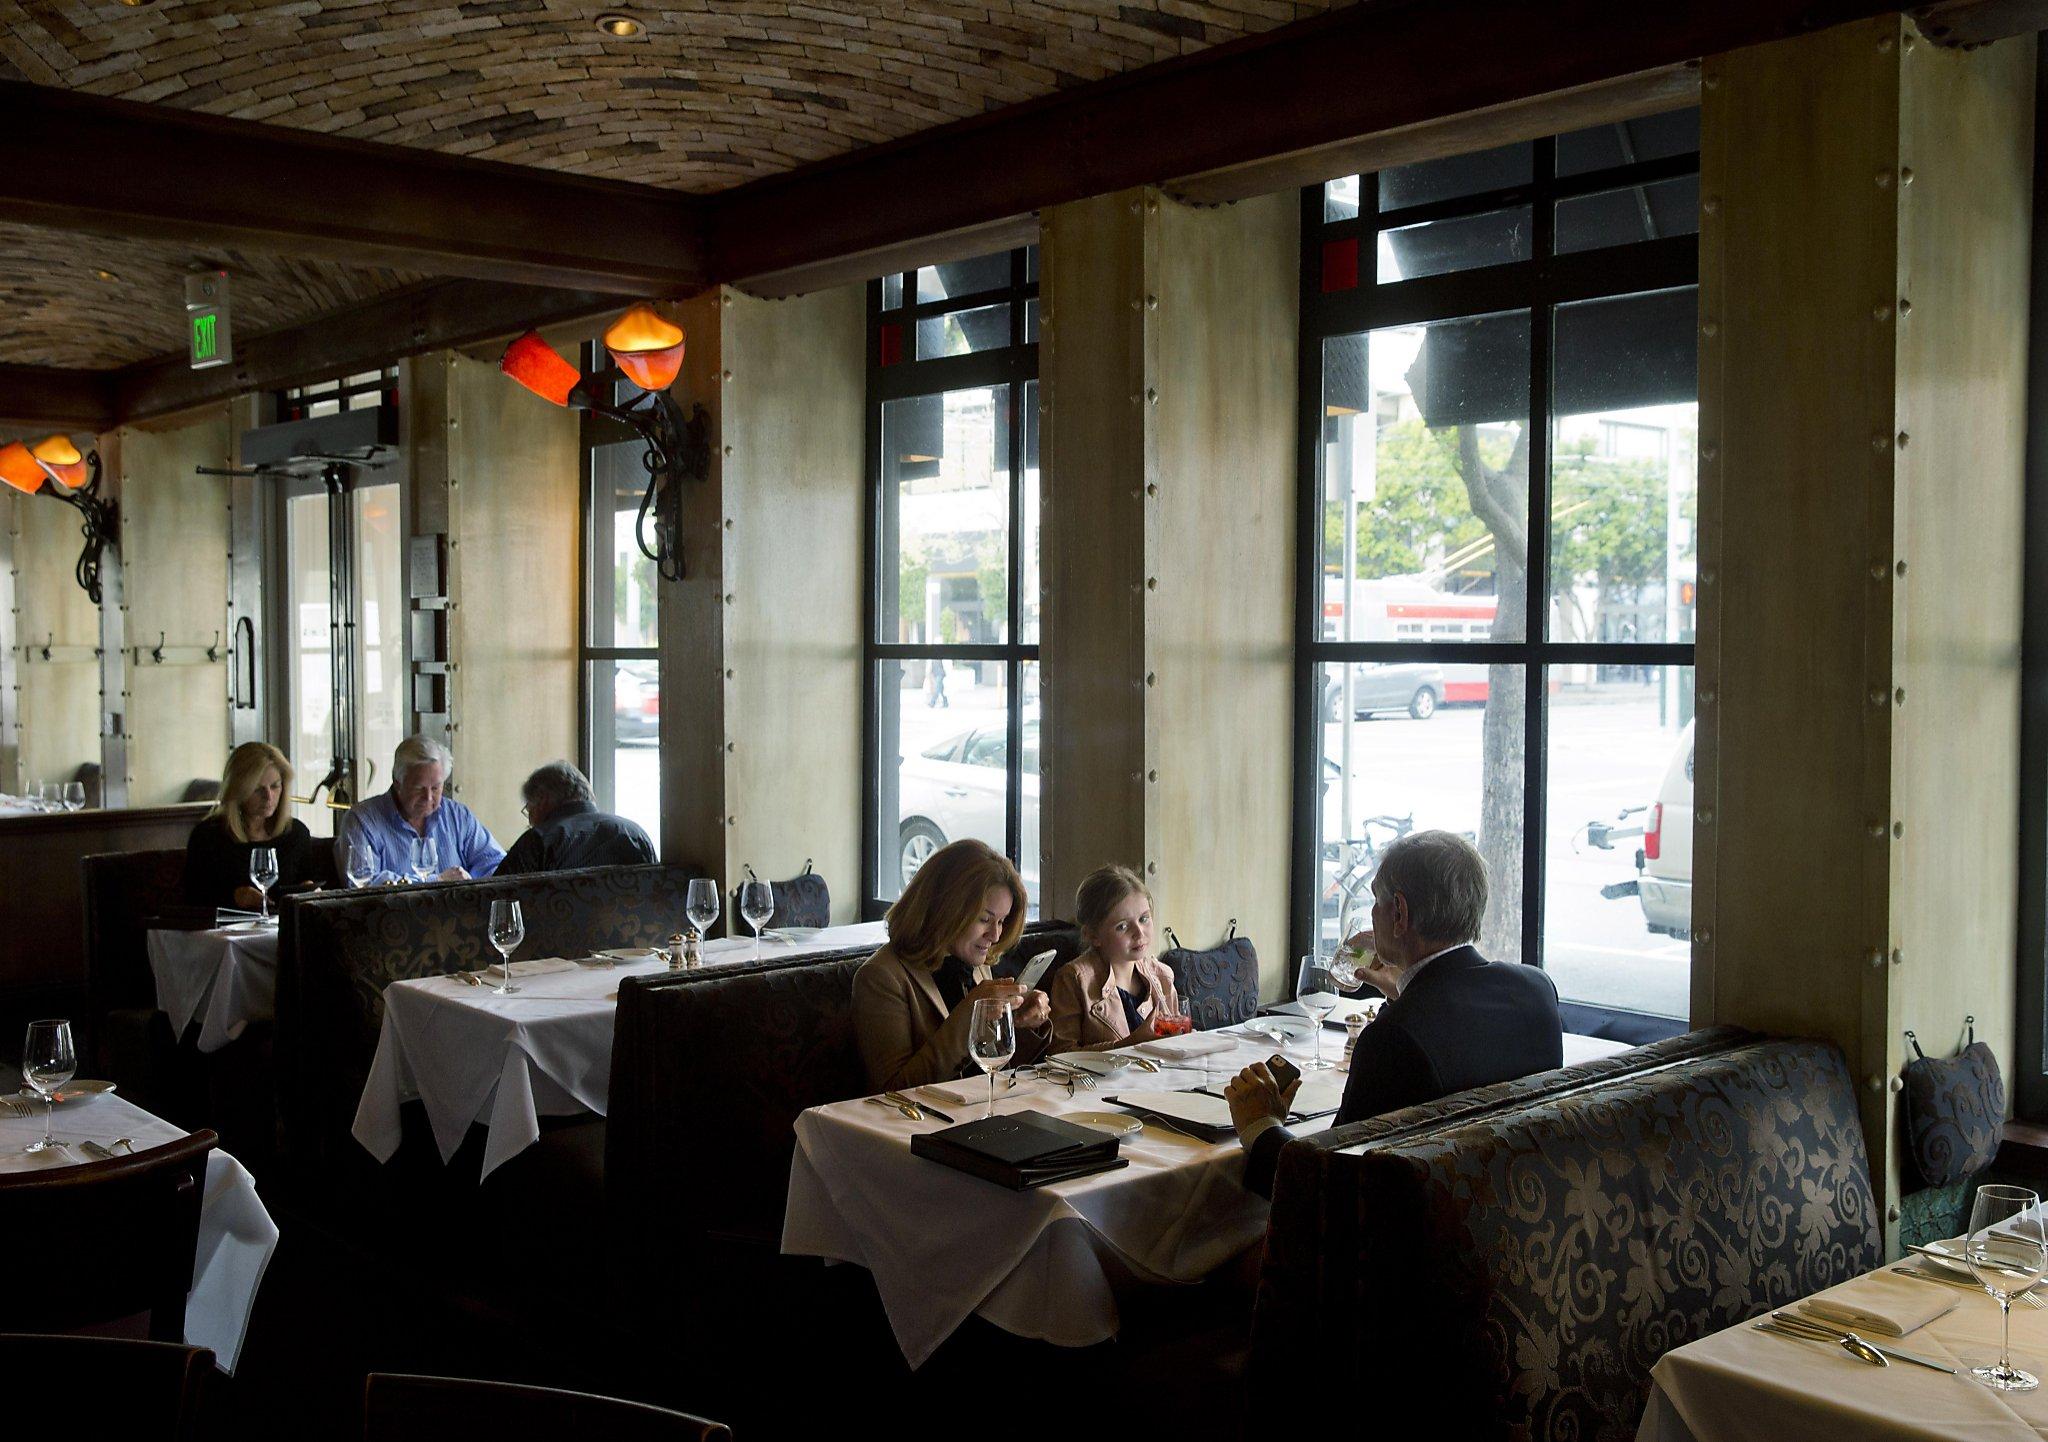 Is this San Francisco's most romantic restaurant? TripAdvisor users seem to think so.